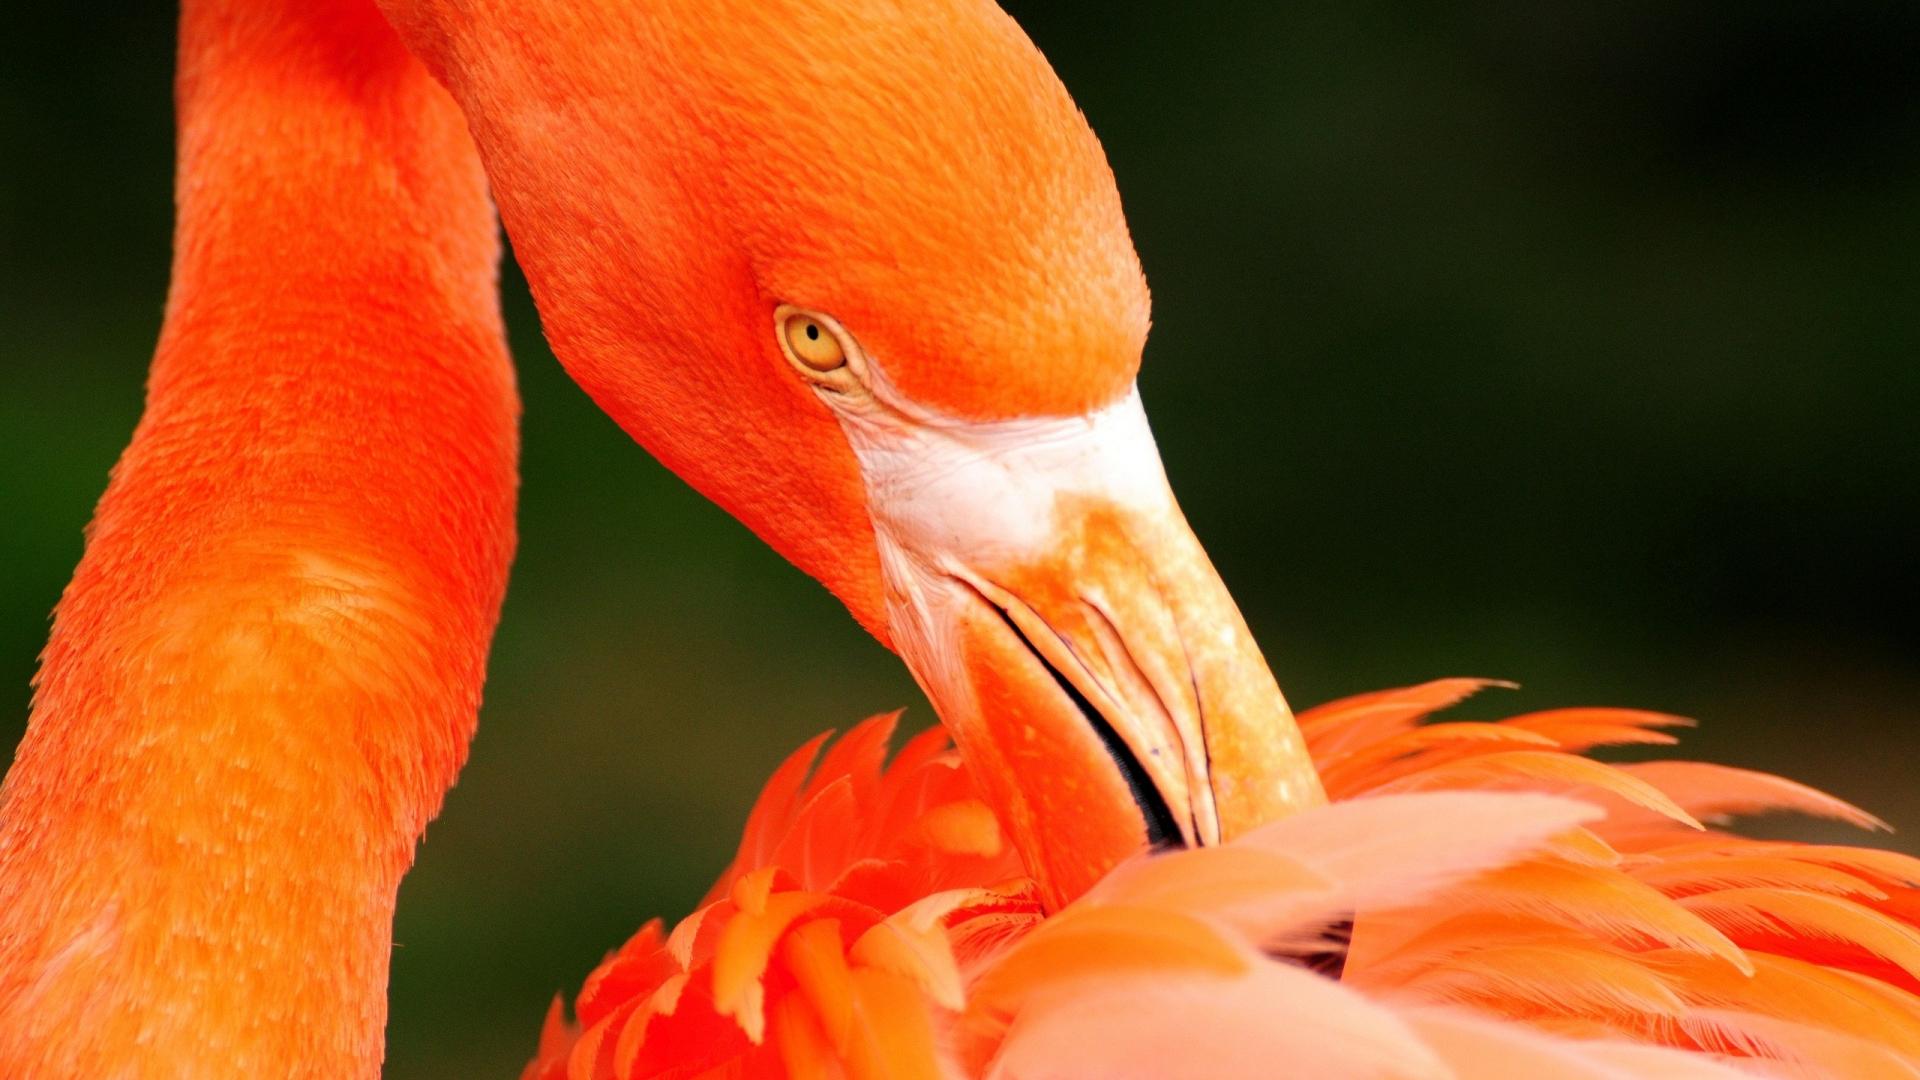 Beautiful orange flamingo bird - HD wallpaper